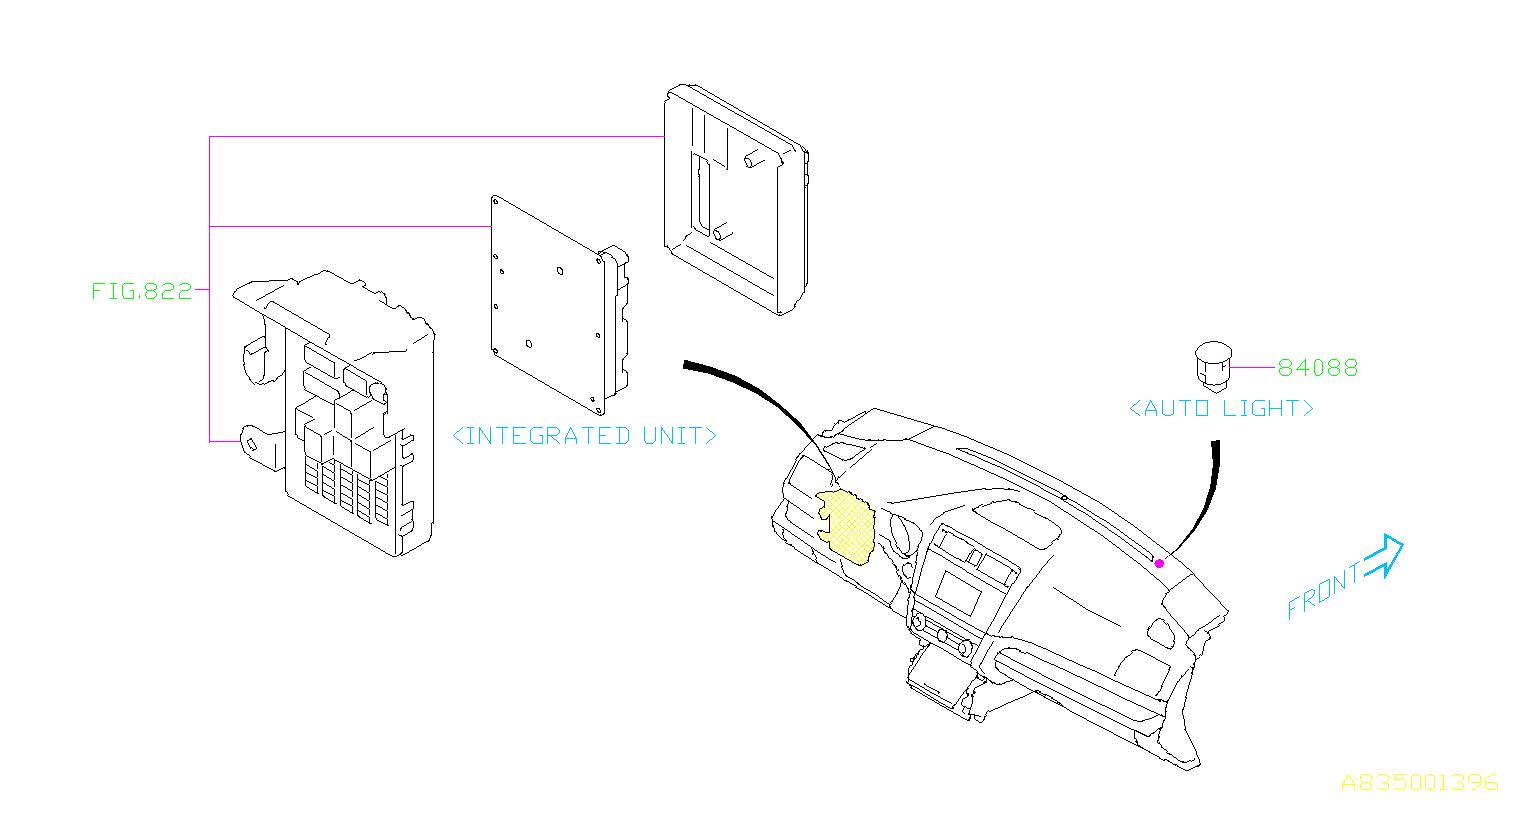 Subaru Legacy Automatic Light Sensor Electrical Panel